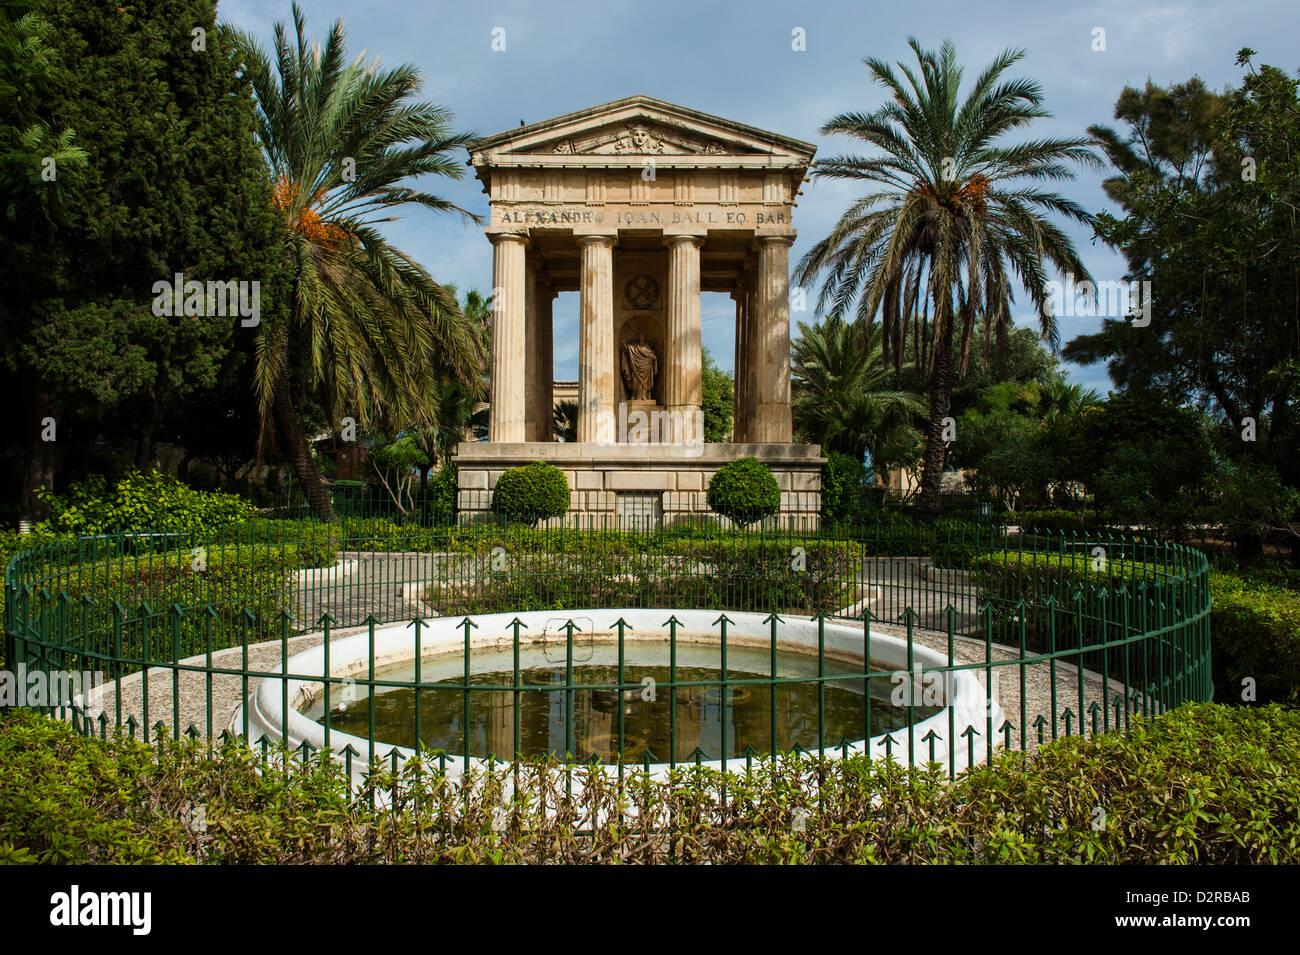 Lower Barrakka Gardens and the Alexander Ball memorial, UNESCO World Heritage Site, Valetta, Malta, Europe - Stock Image